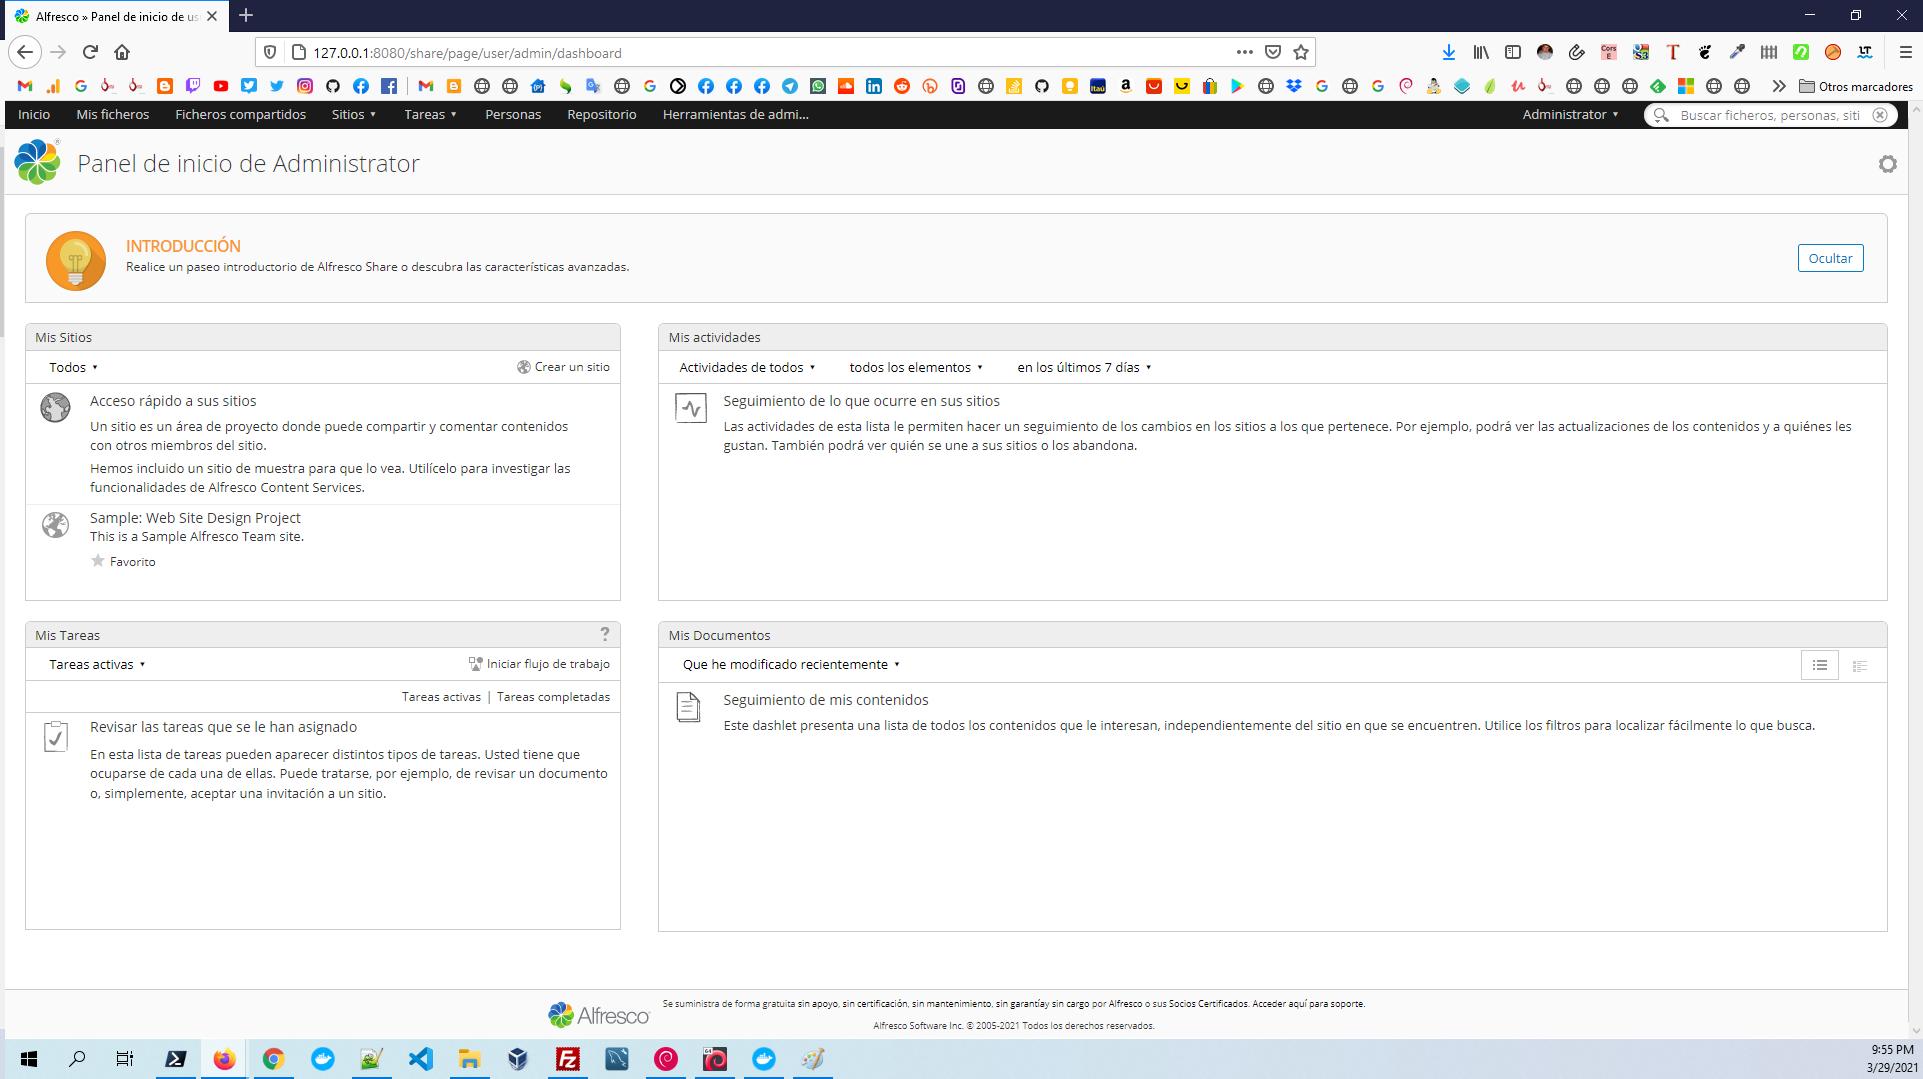 Alfresco Community Edition 7.0 - share